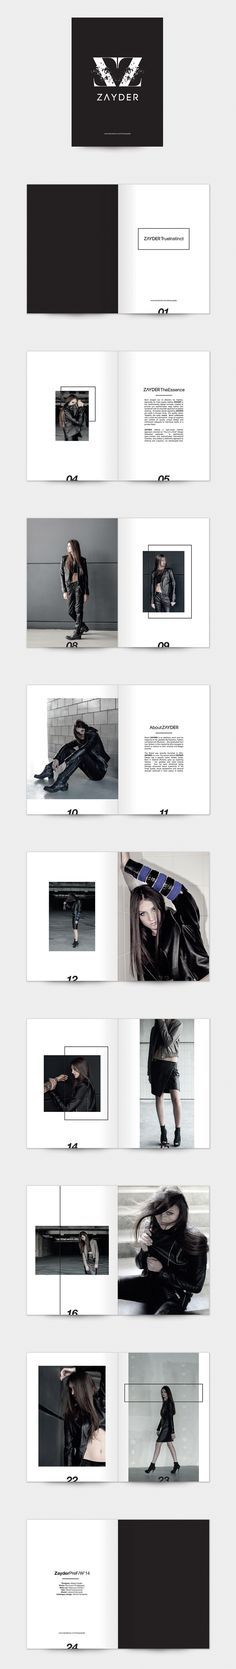 Zayder - katalog F/W'14